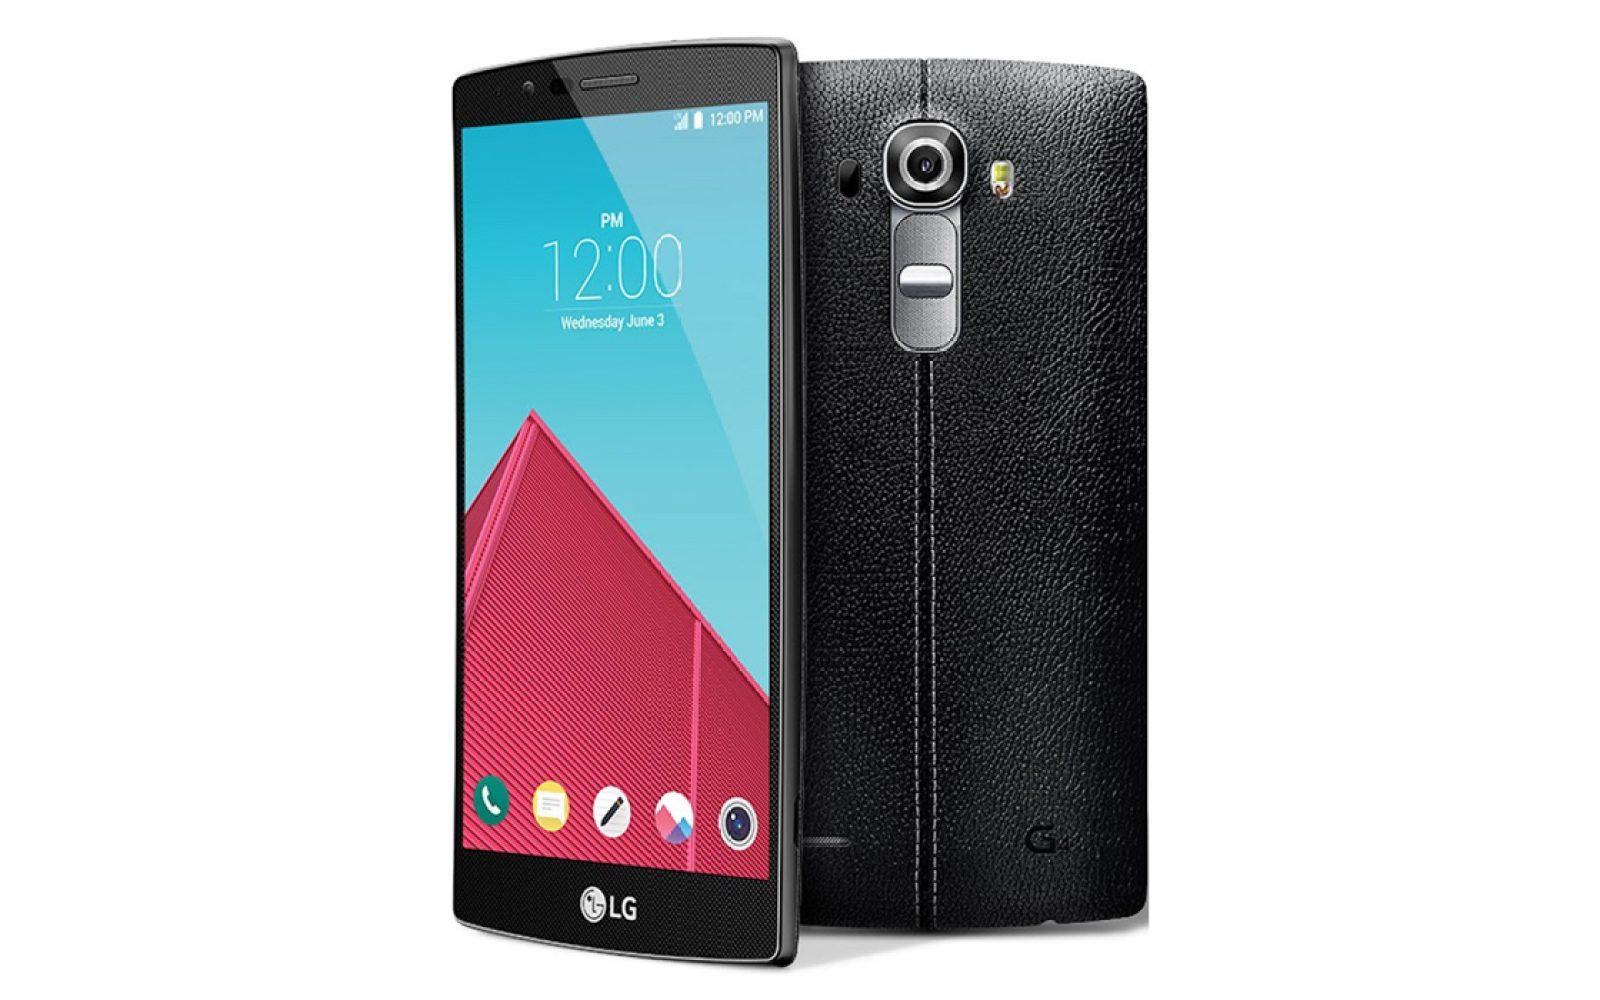 LG G4 - 9to5Google